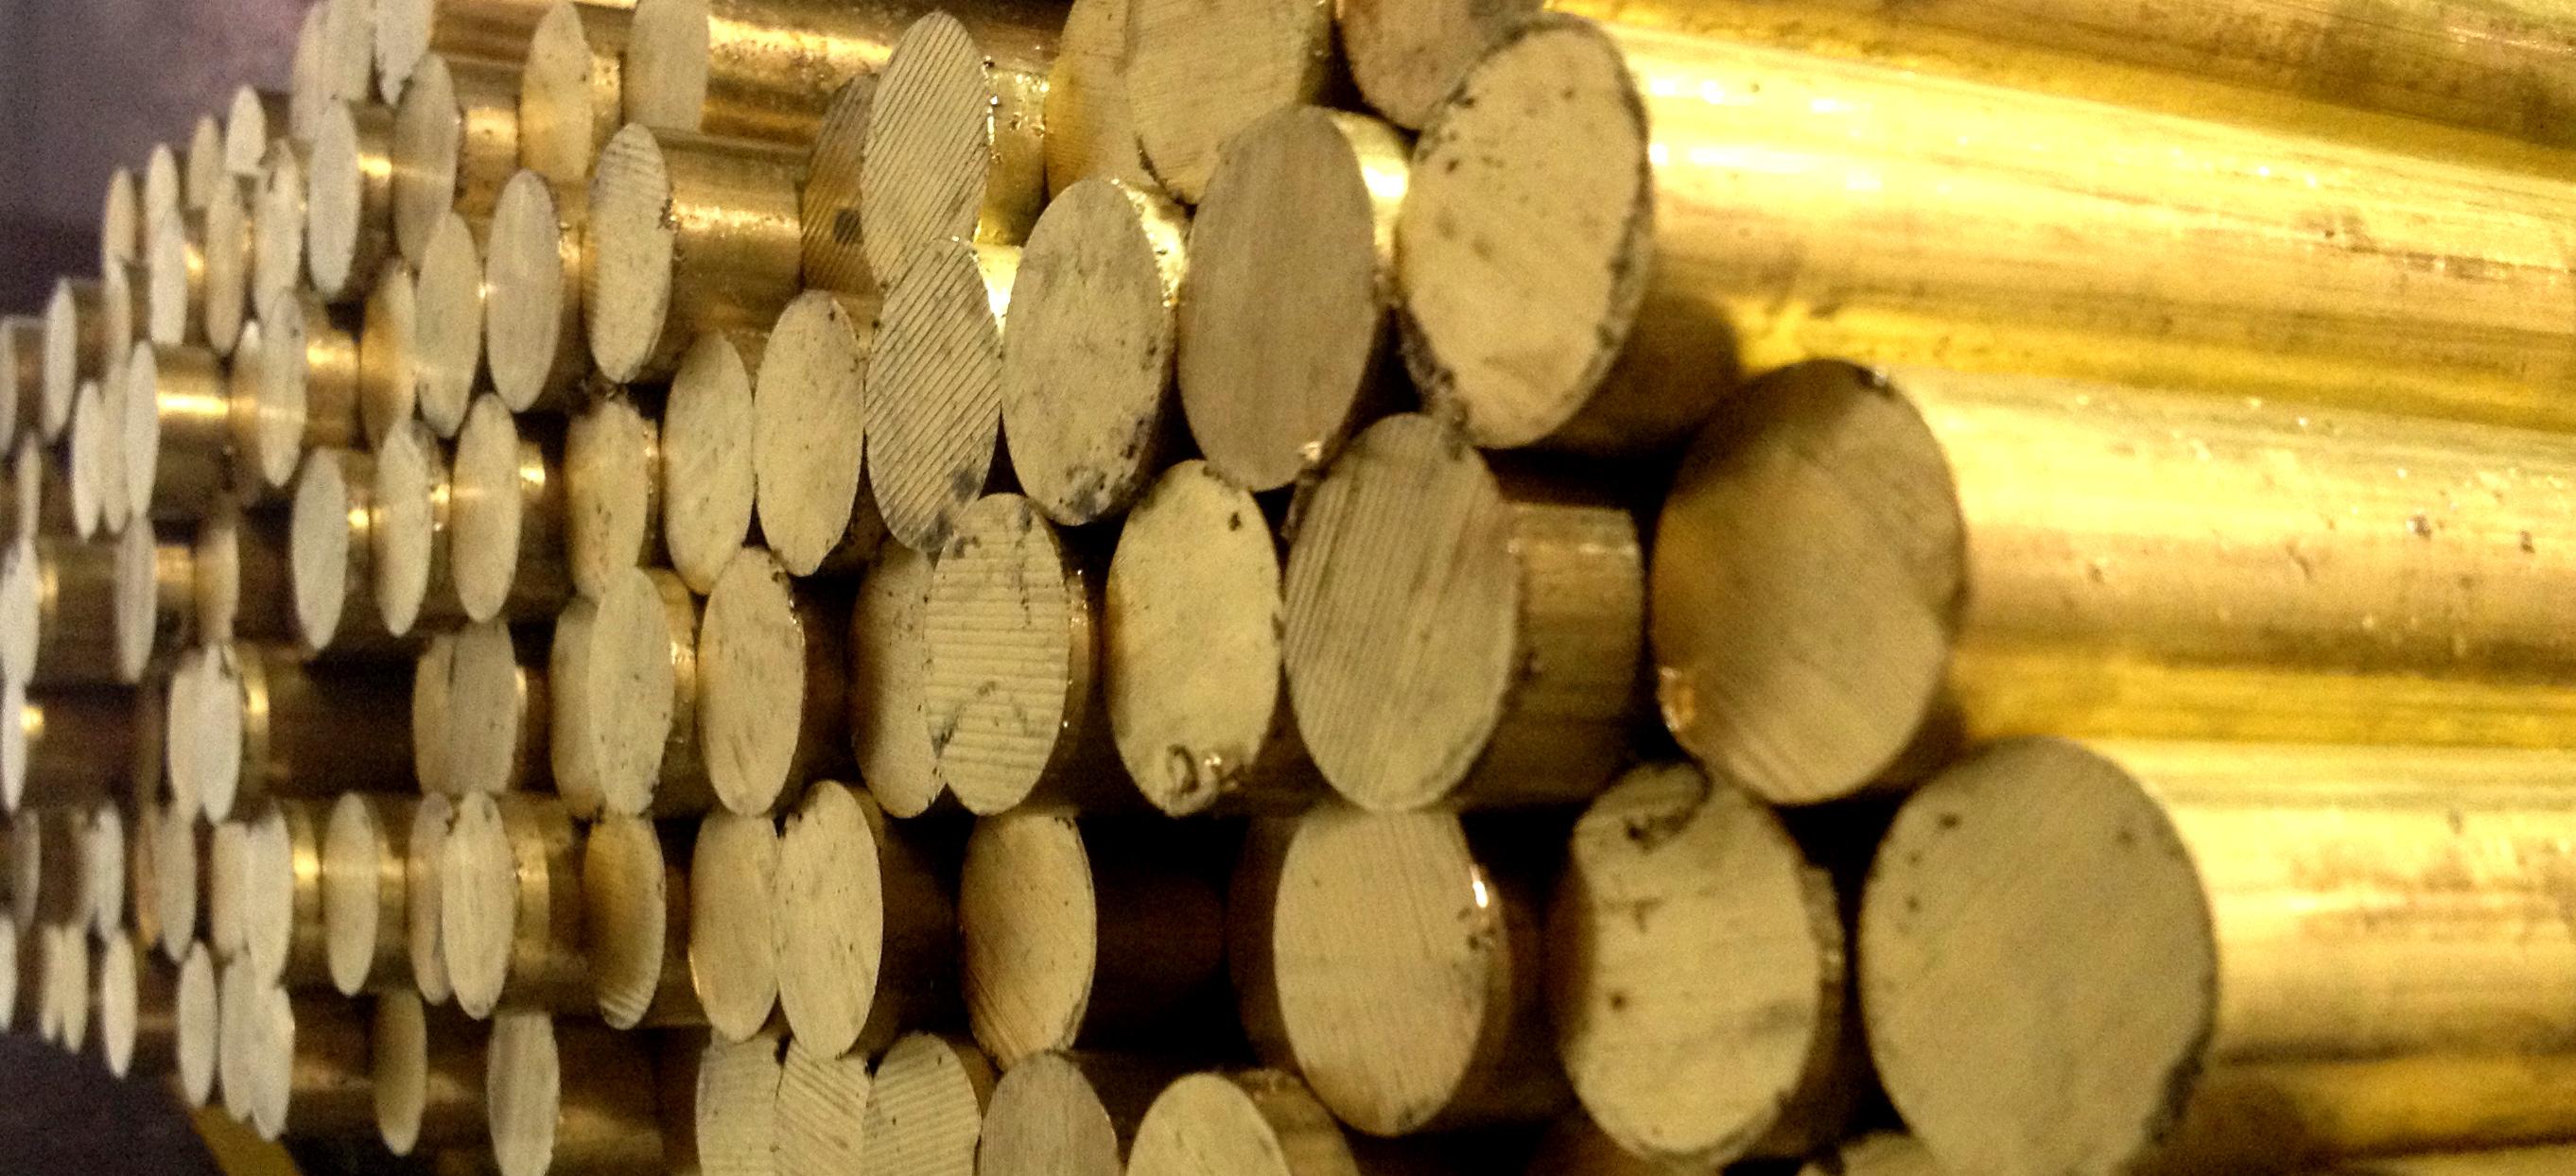 C36000 Brass Bar Stock